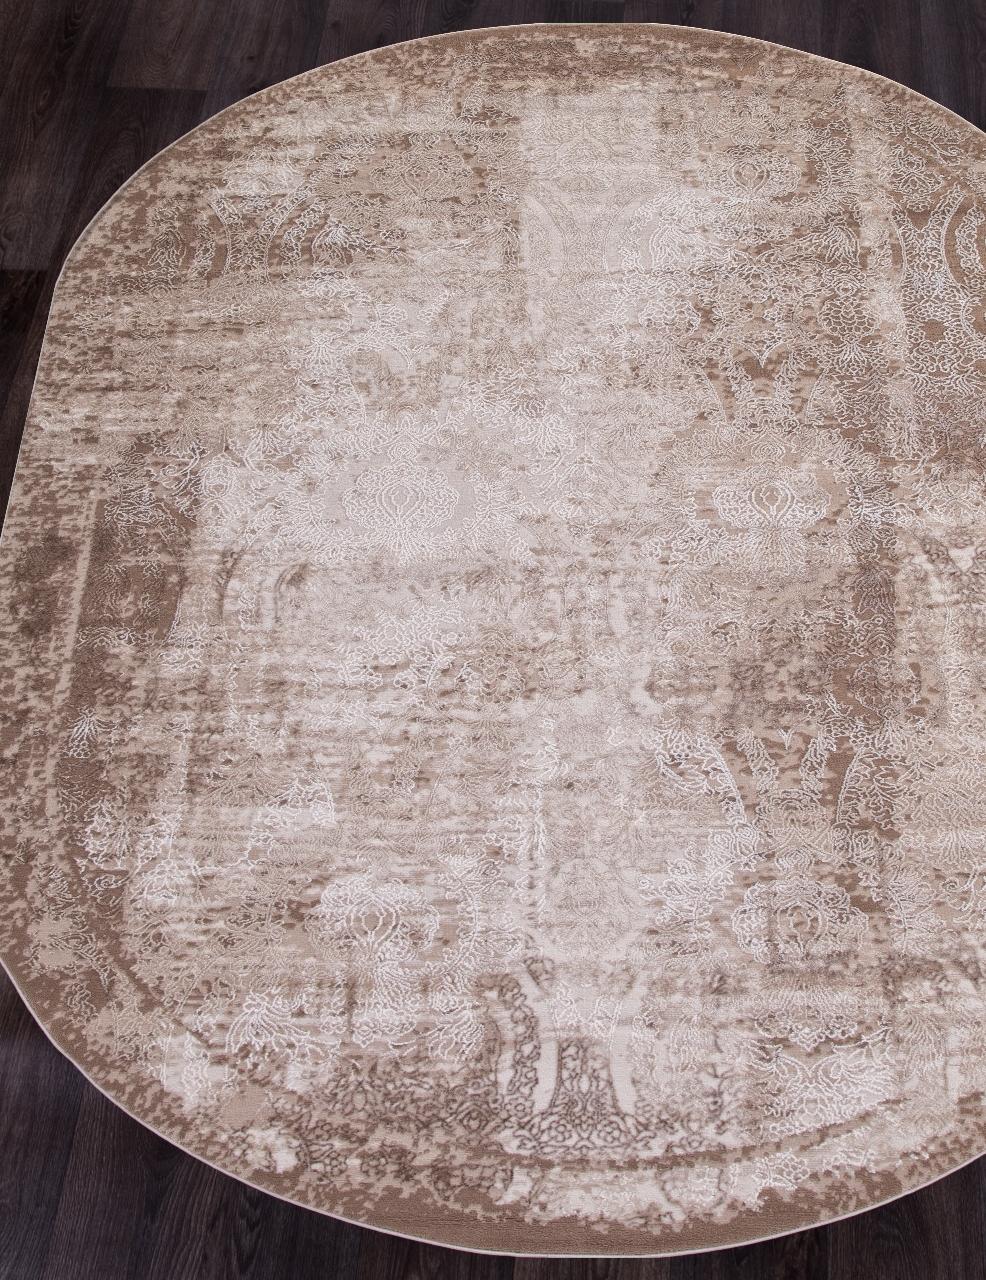 Ковер 03711A - BROWN / BROWN - Овал - коллекция ARMINA - фото 1